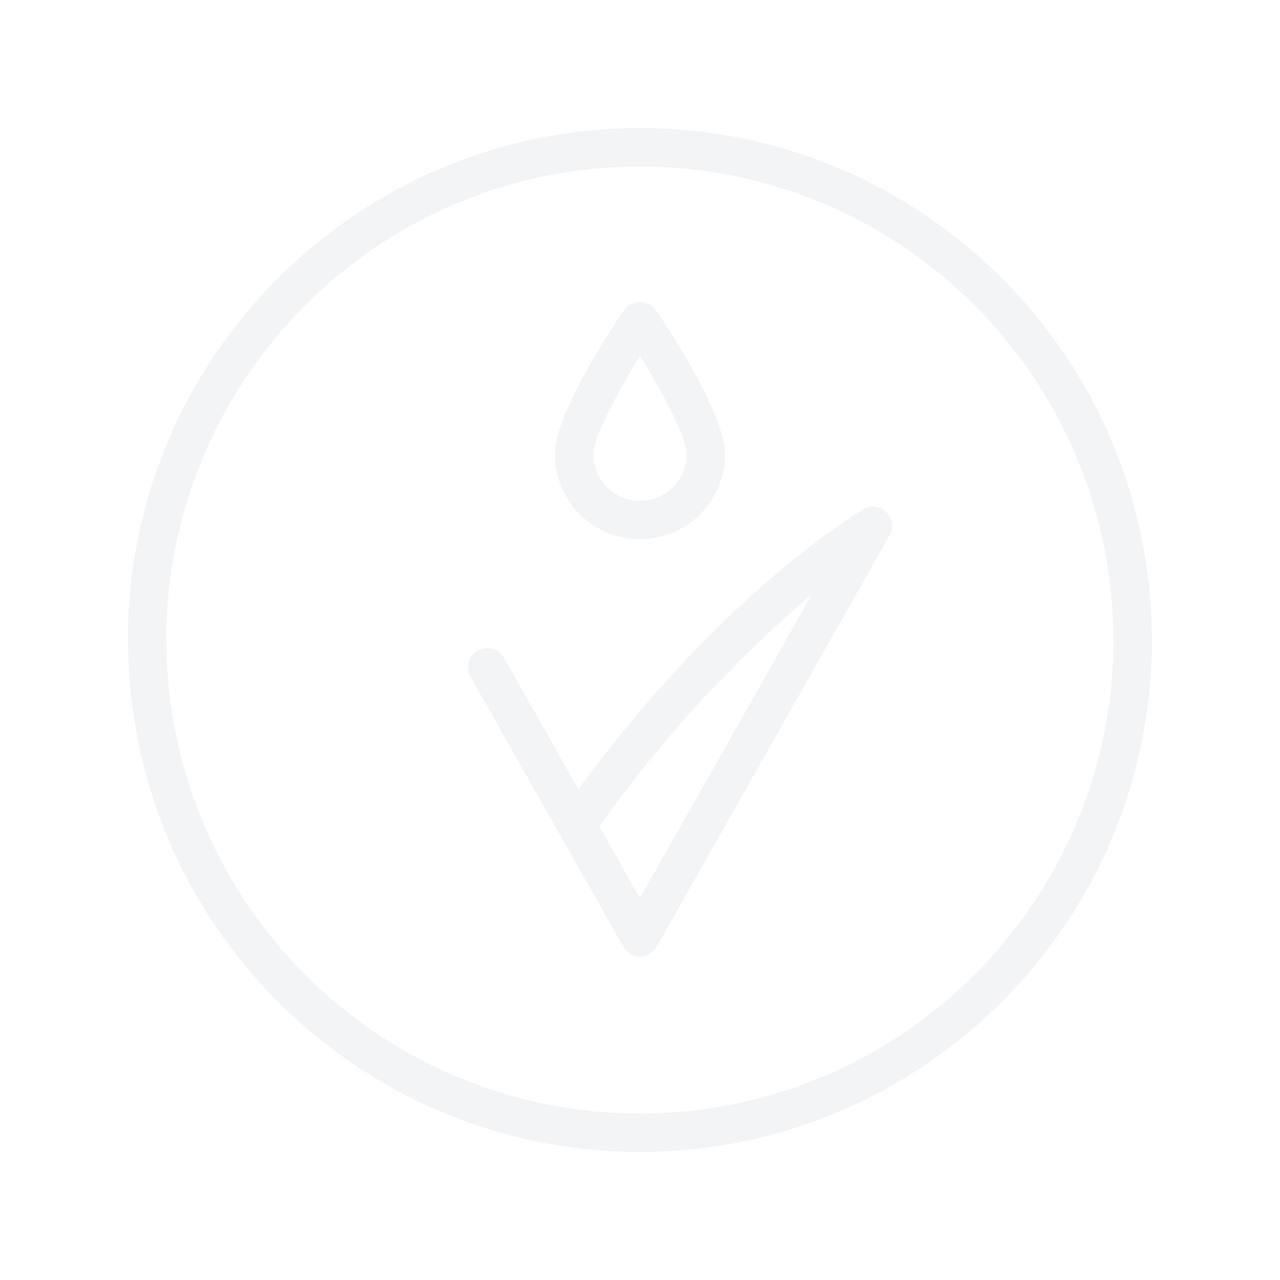 BIOKAP Nutricolor Delicato+ 8.64 Permanent Hair Dye 140ml